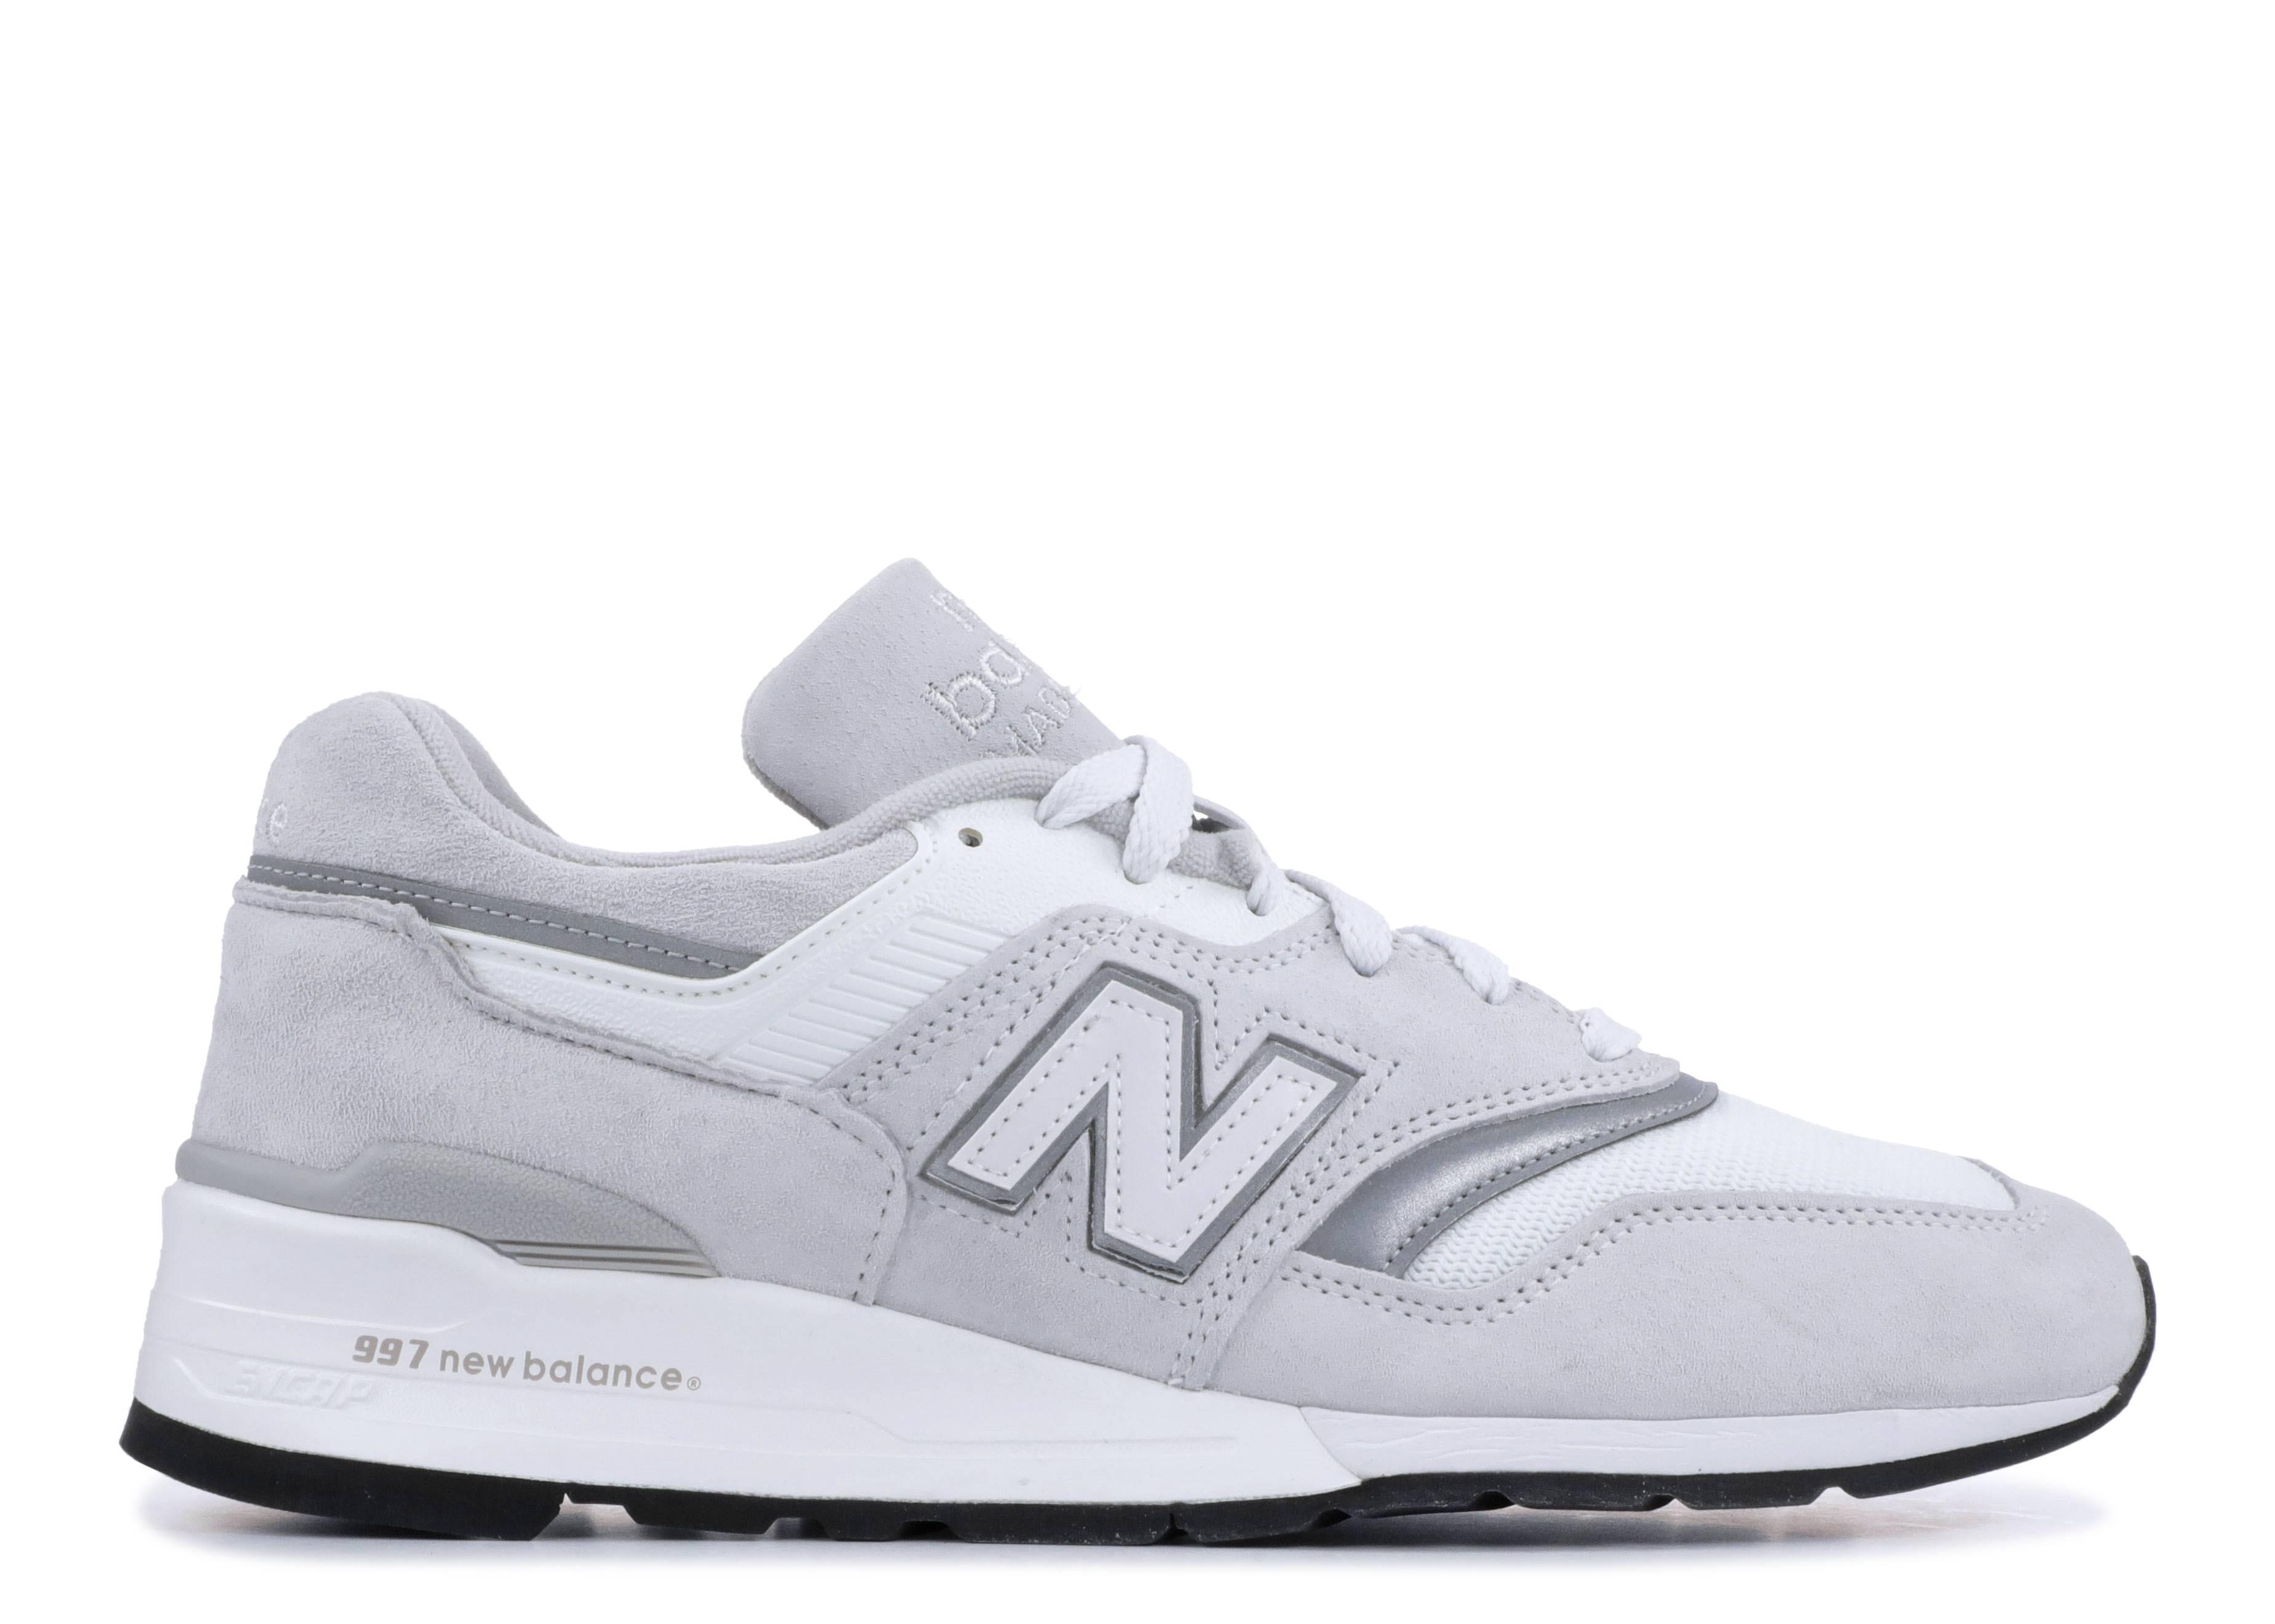 ed51278e92 New Balance Sneakers for Men | Flight Club